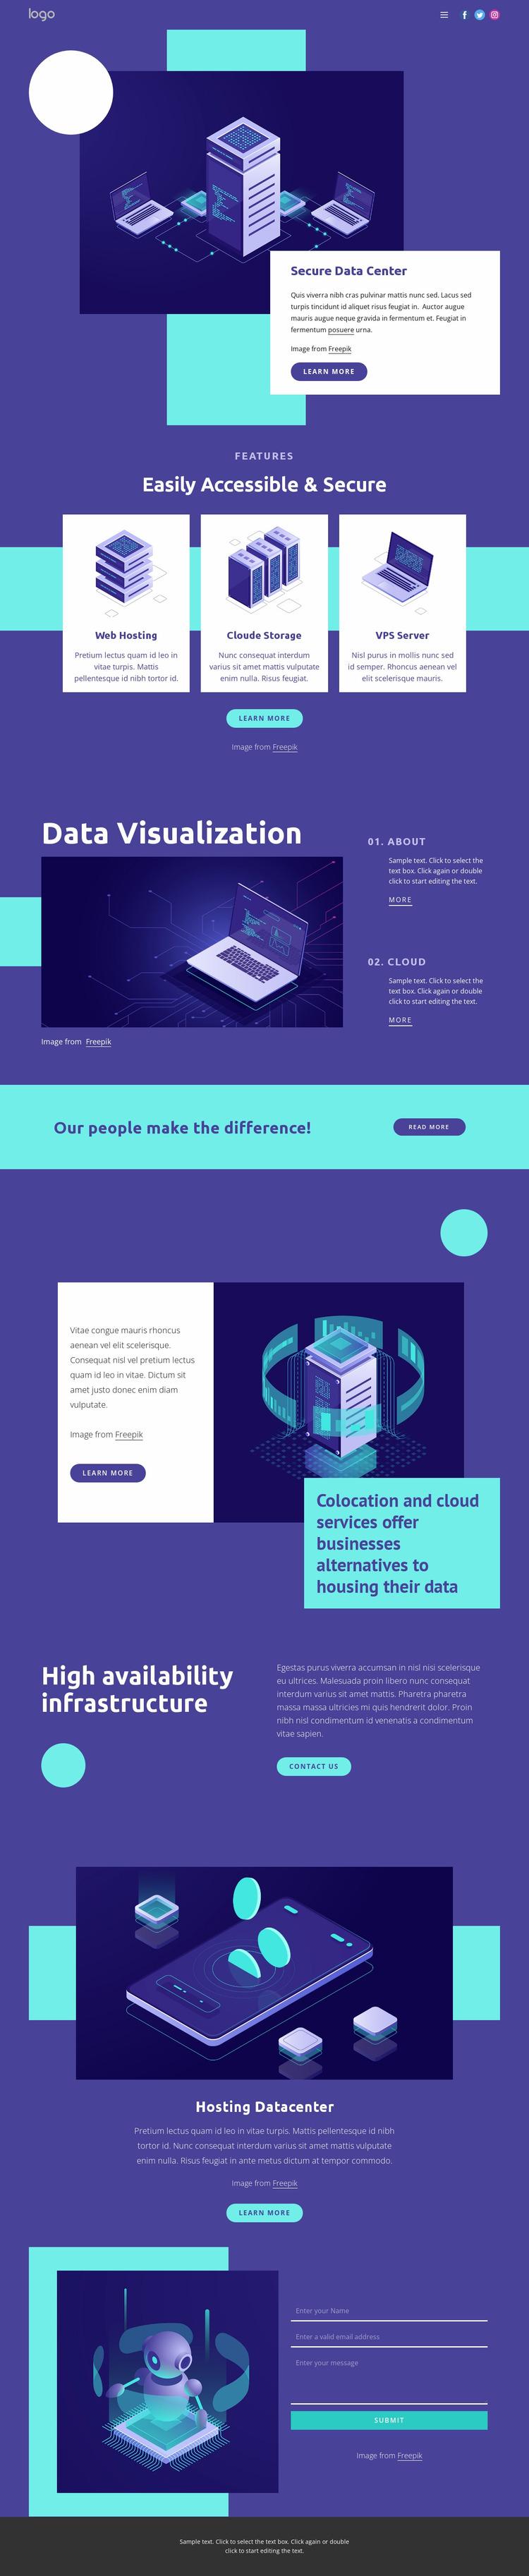 Data Center security solutions Website Mockup